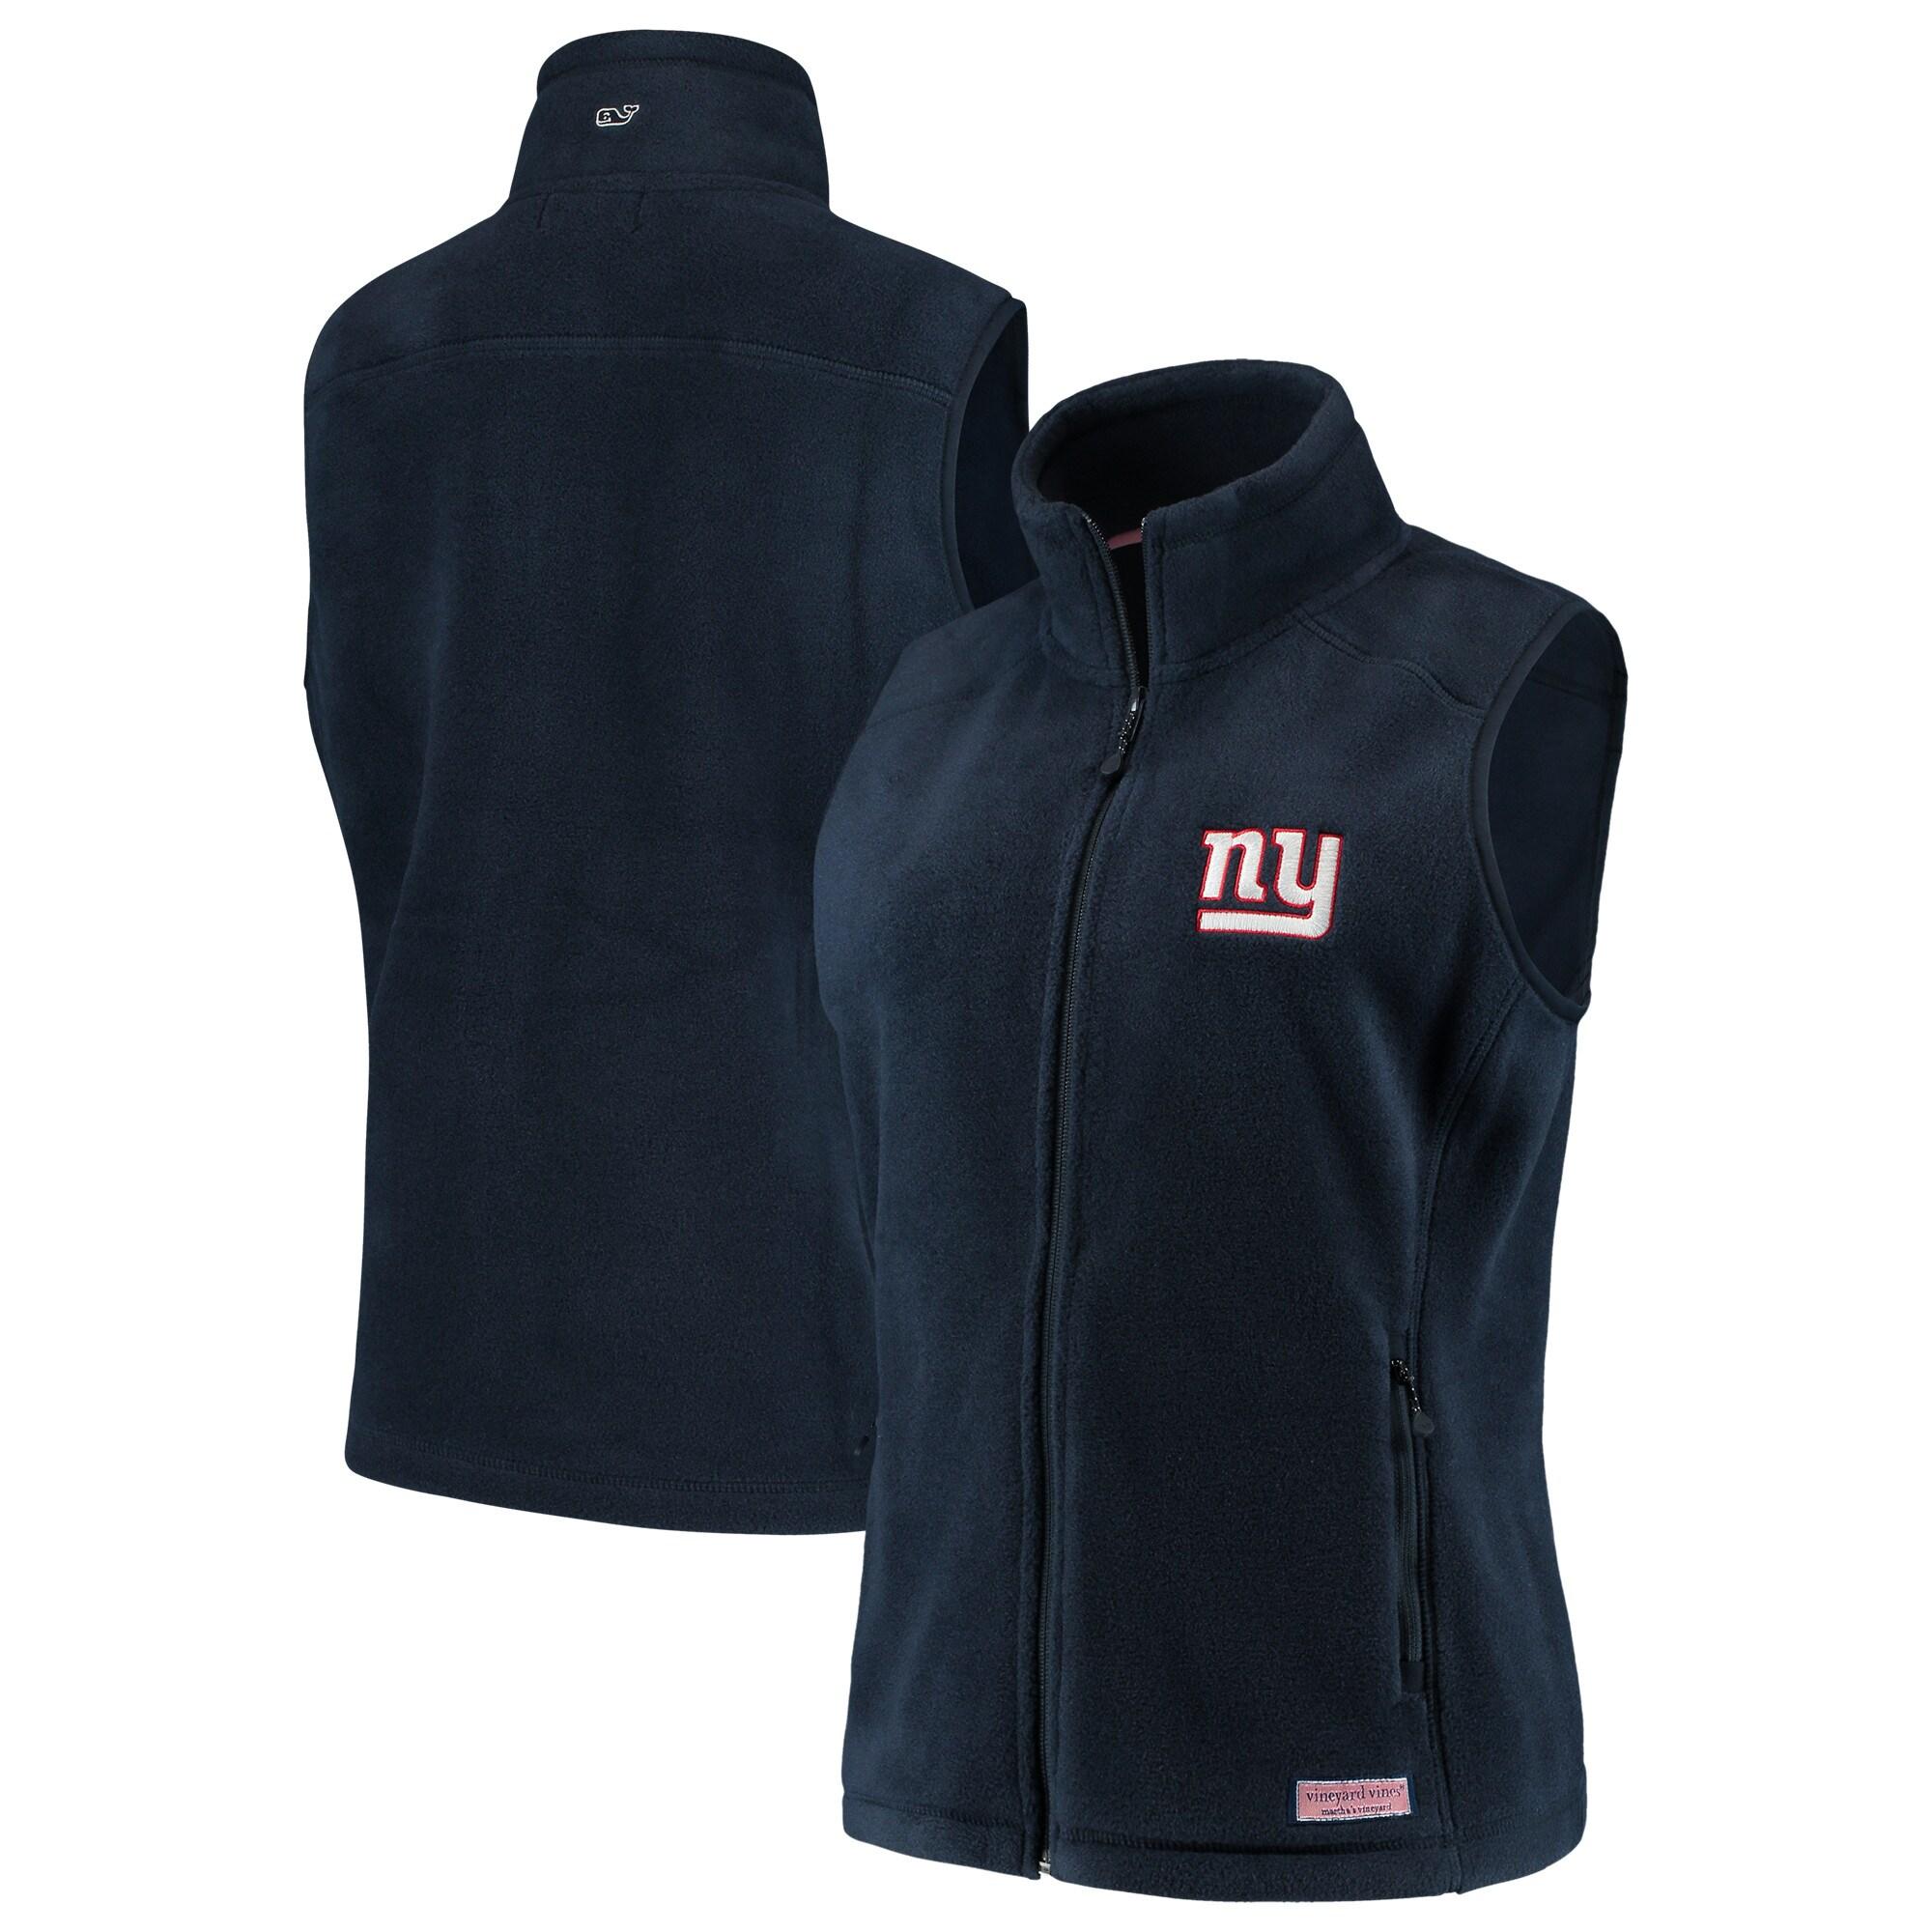 New York Giants Vineyard Vines Women's Westerly Vest - Navy